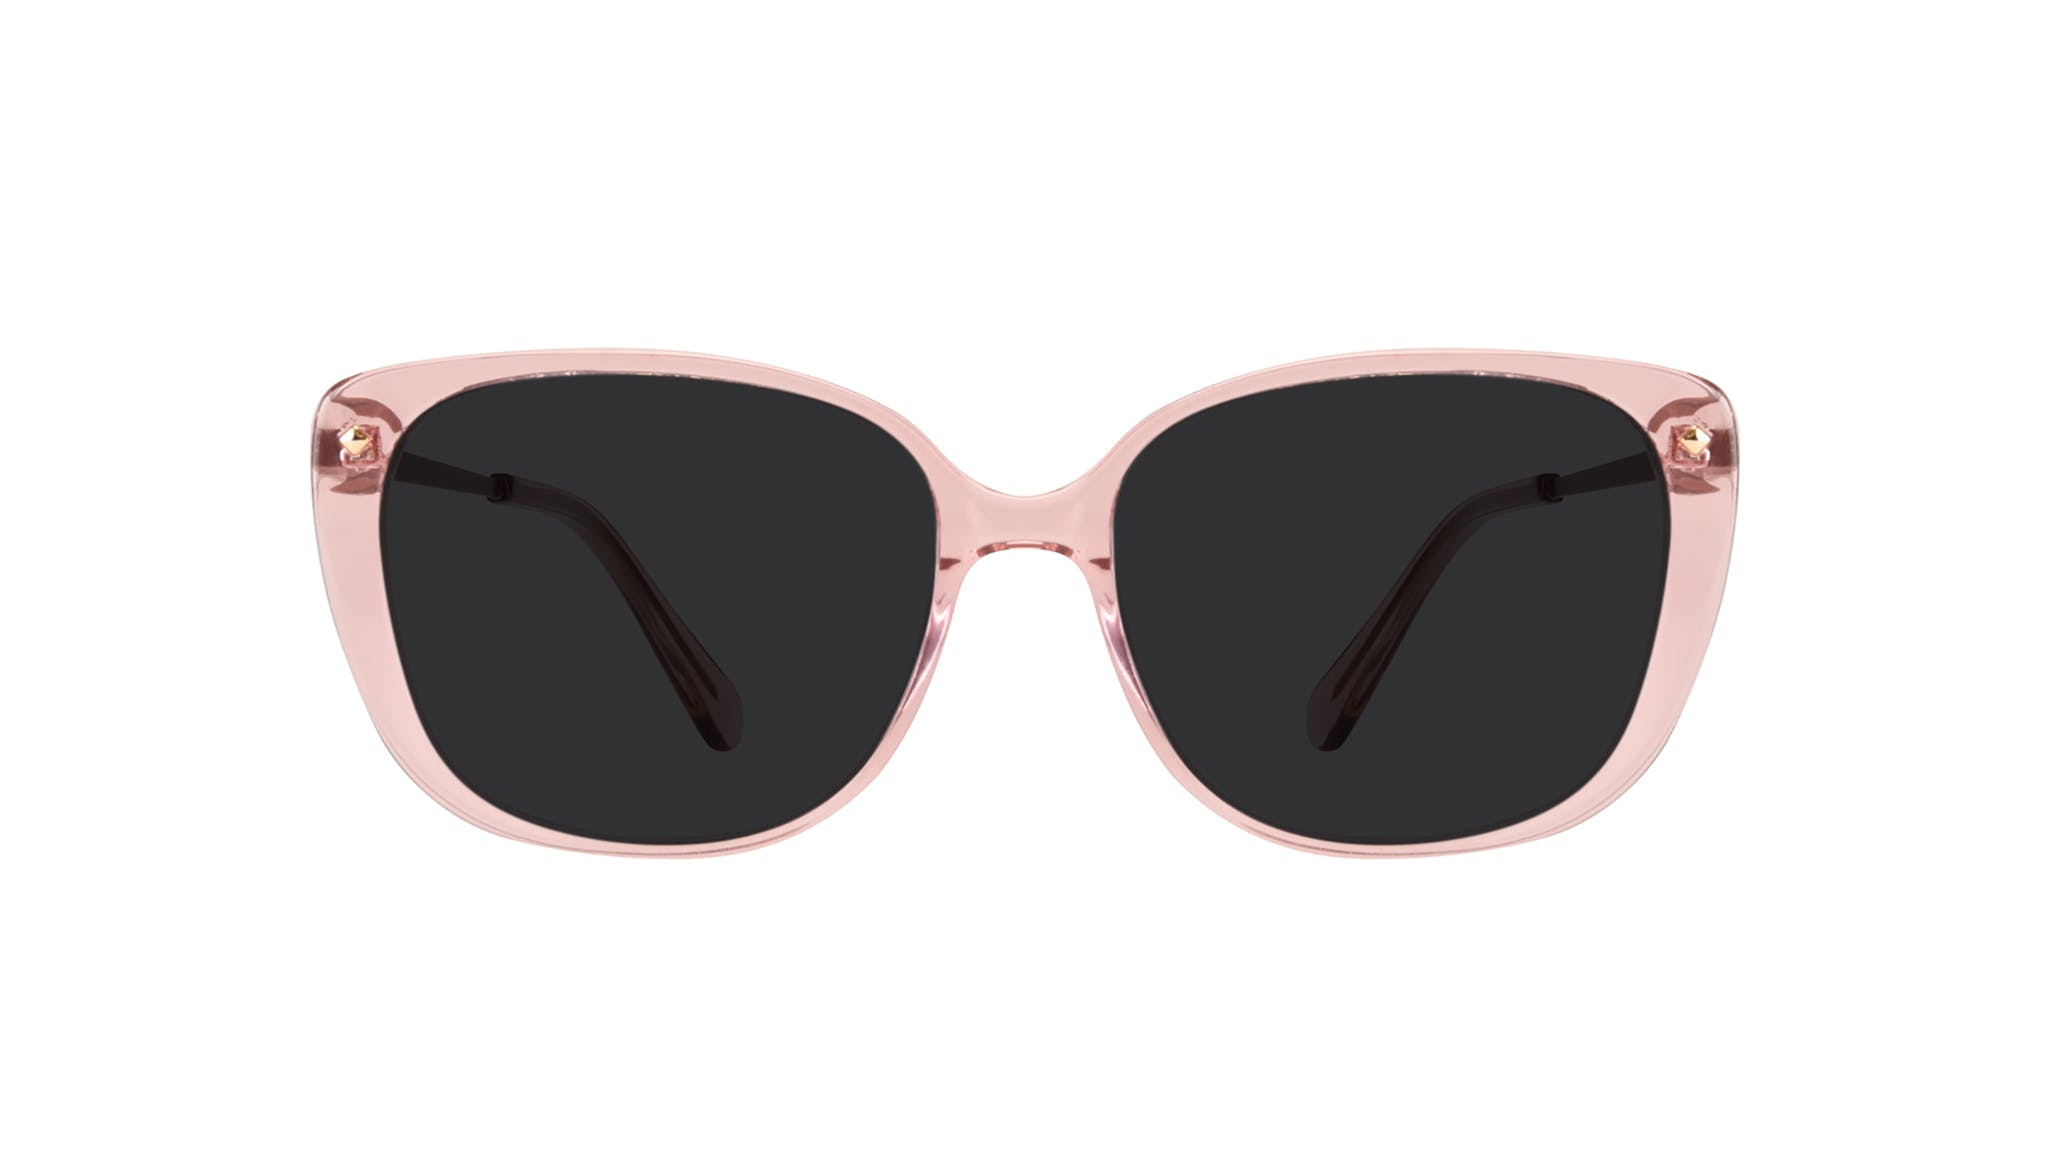 Affordable Fashion Glasses Square Sunglasses Women Japonisme rose Front